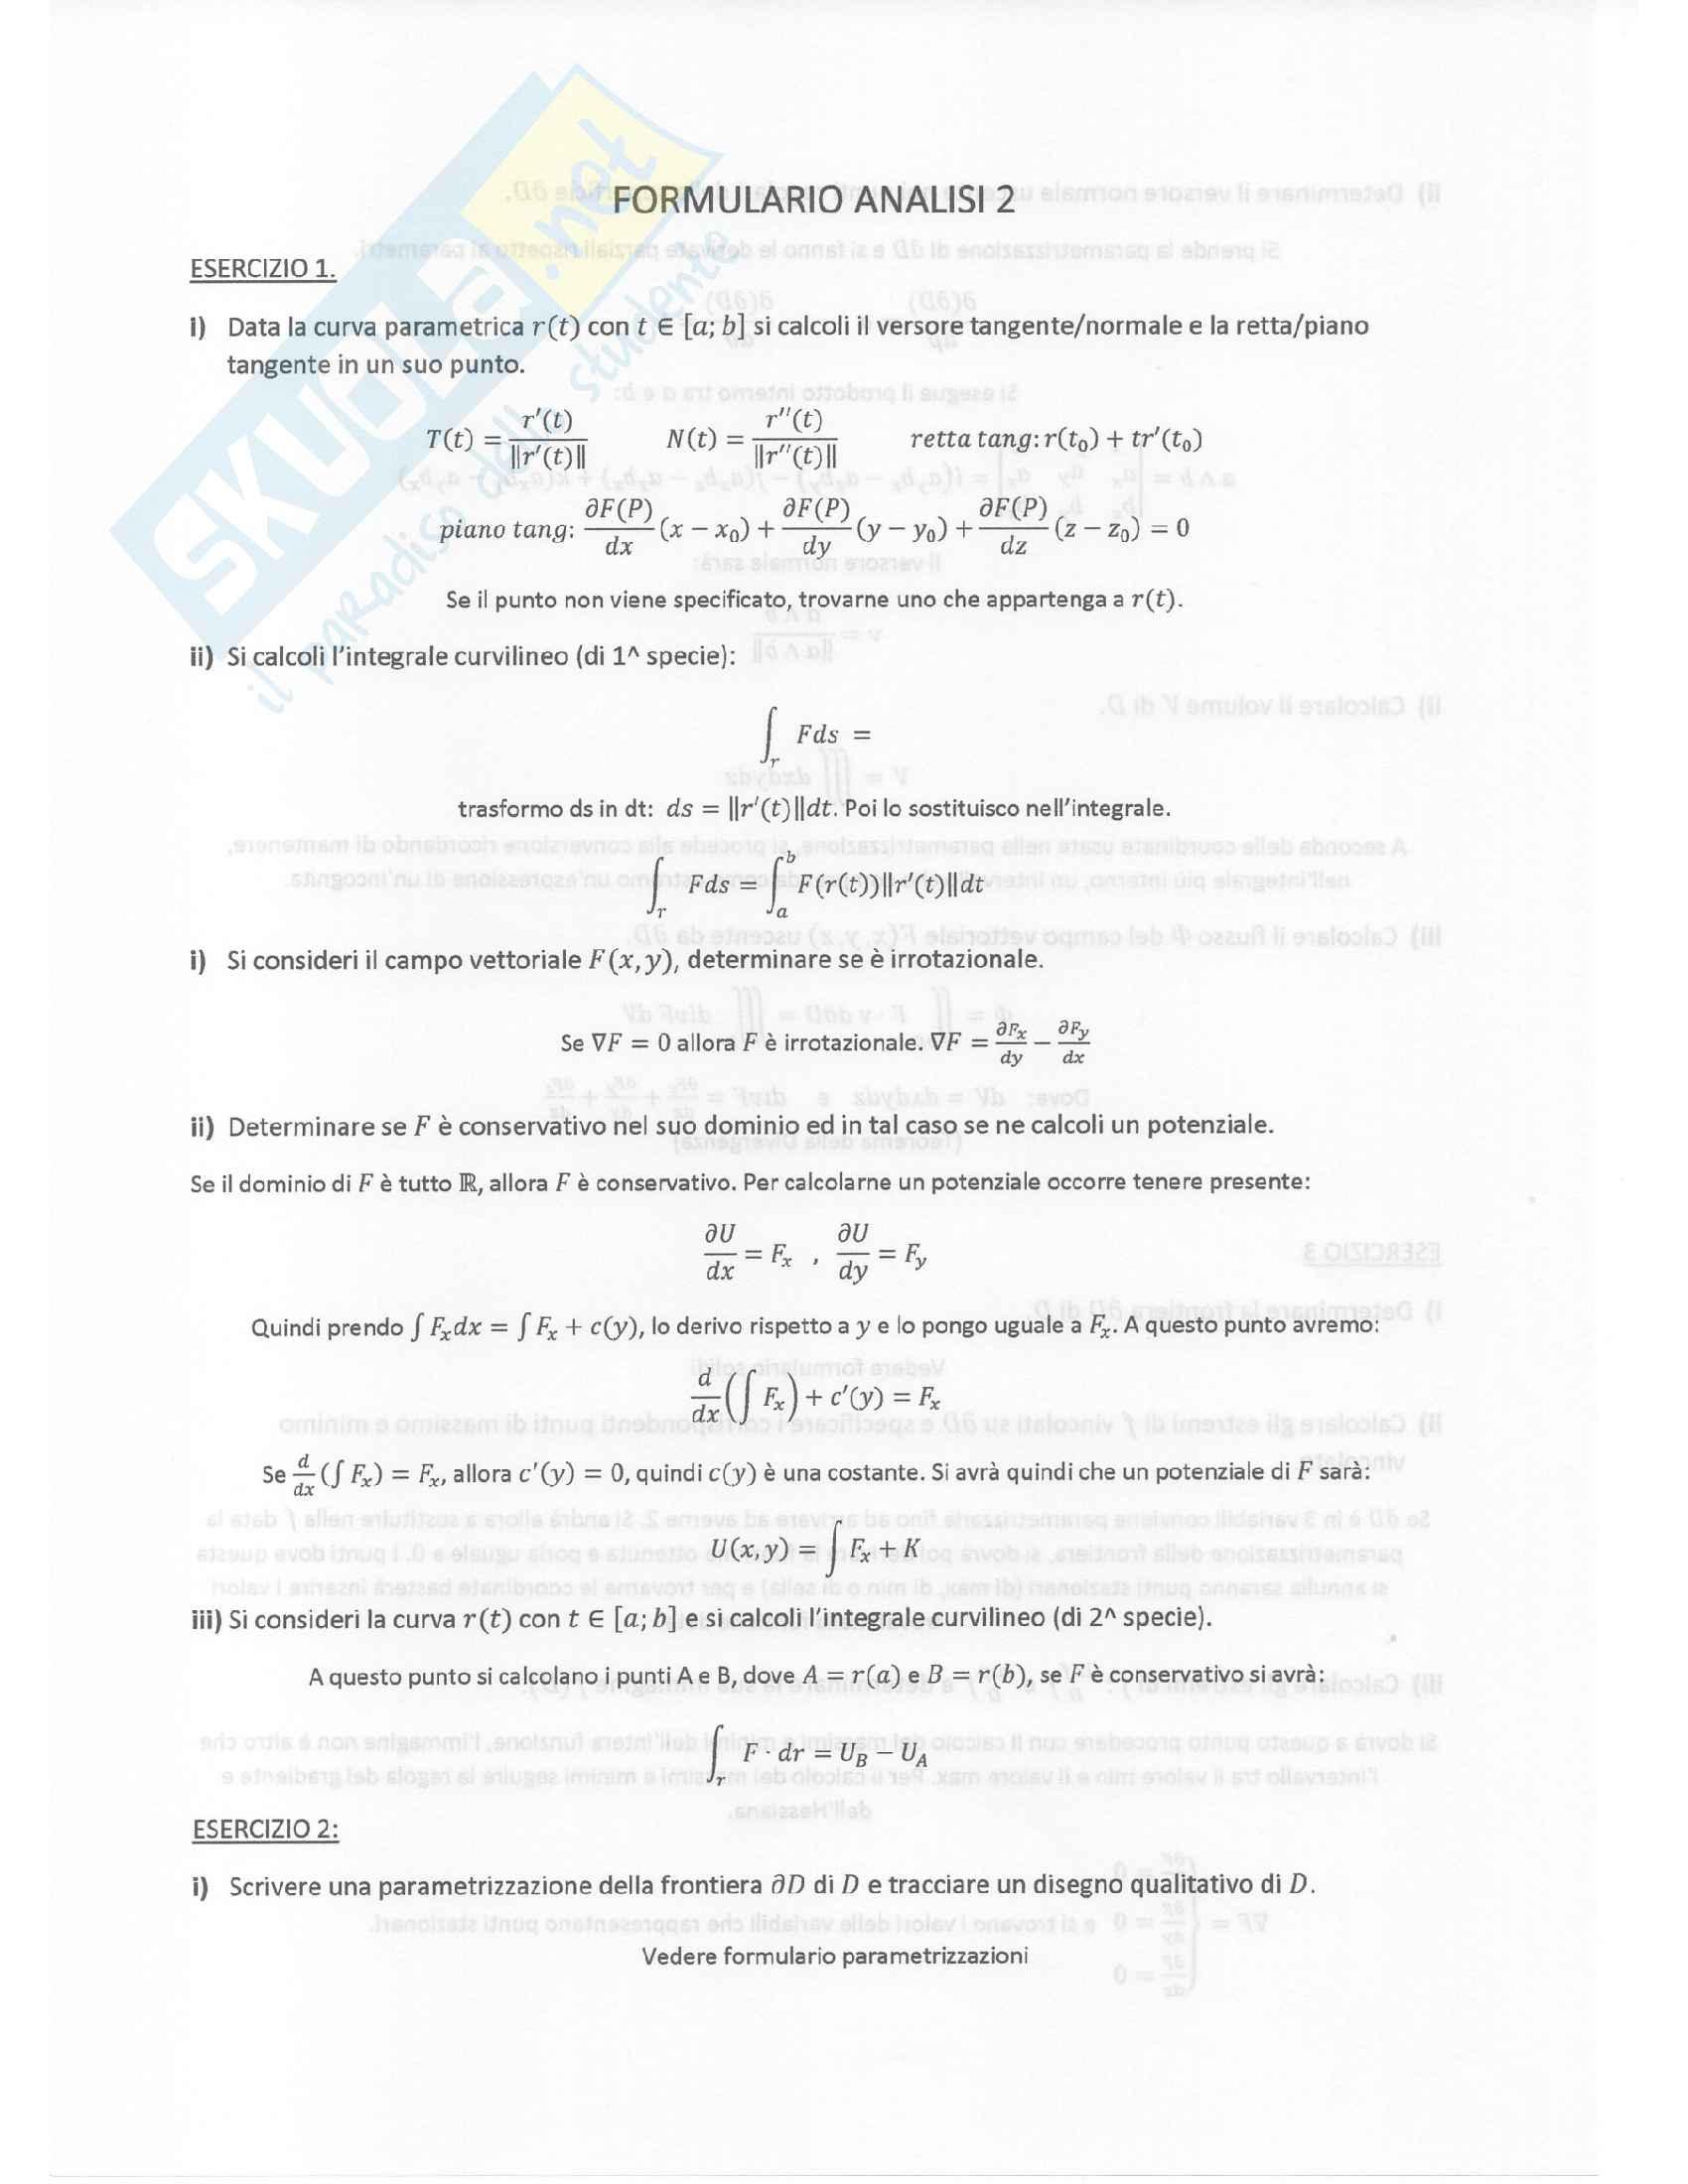 Formulario Analisi 2 Ancona